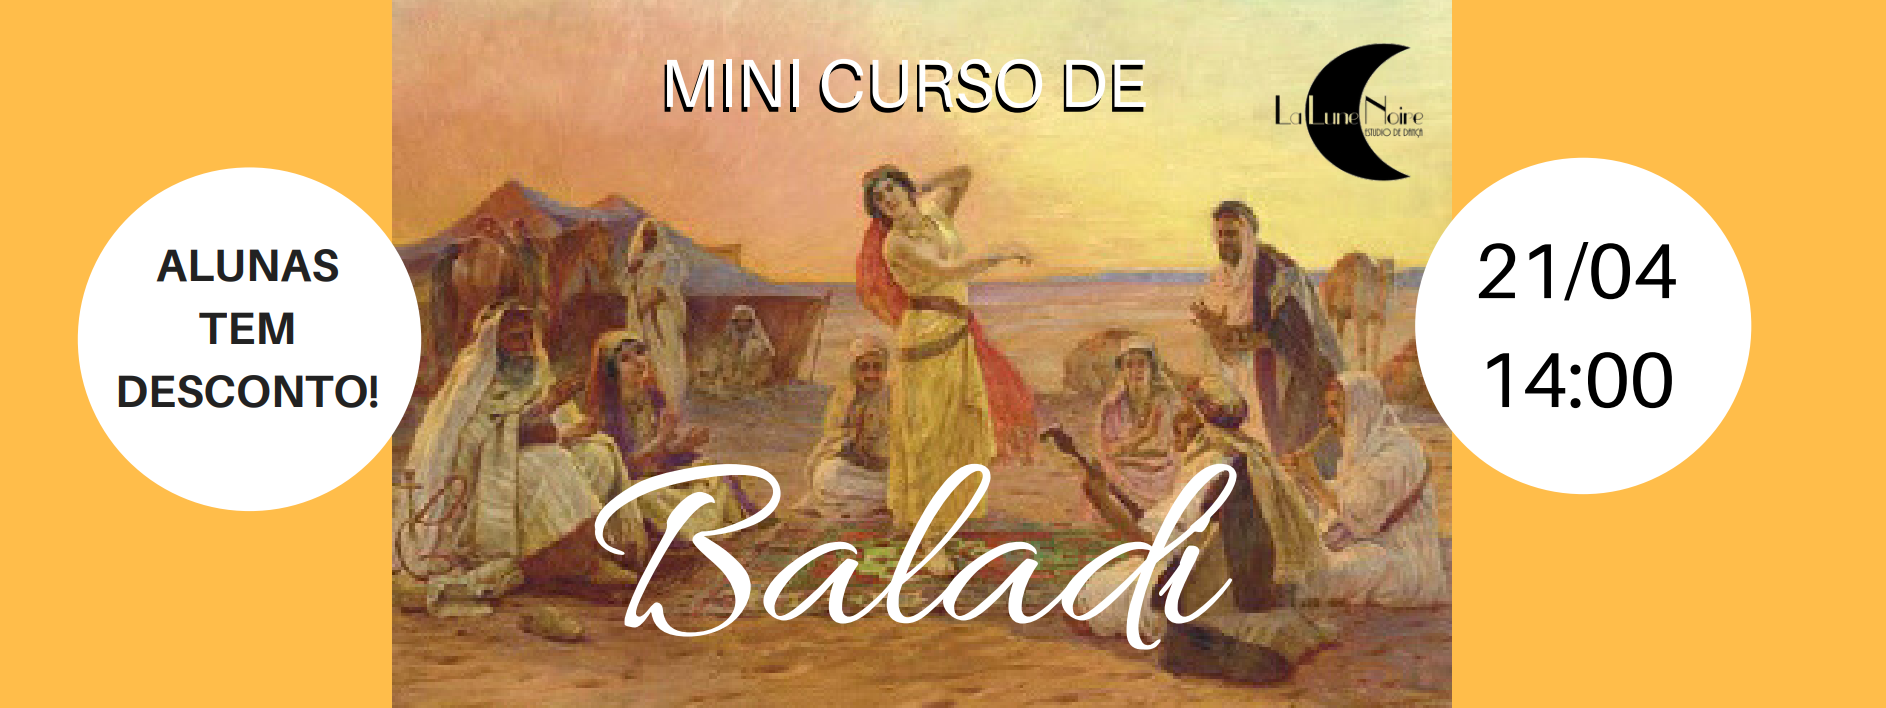 21/04 – Mini Curso Baladi